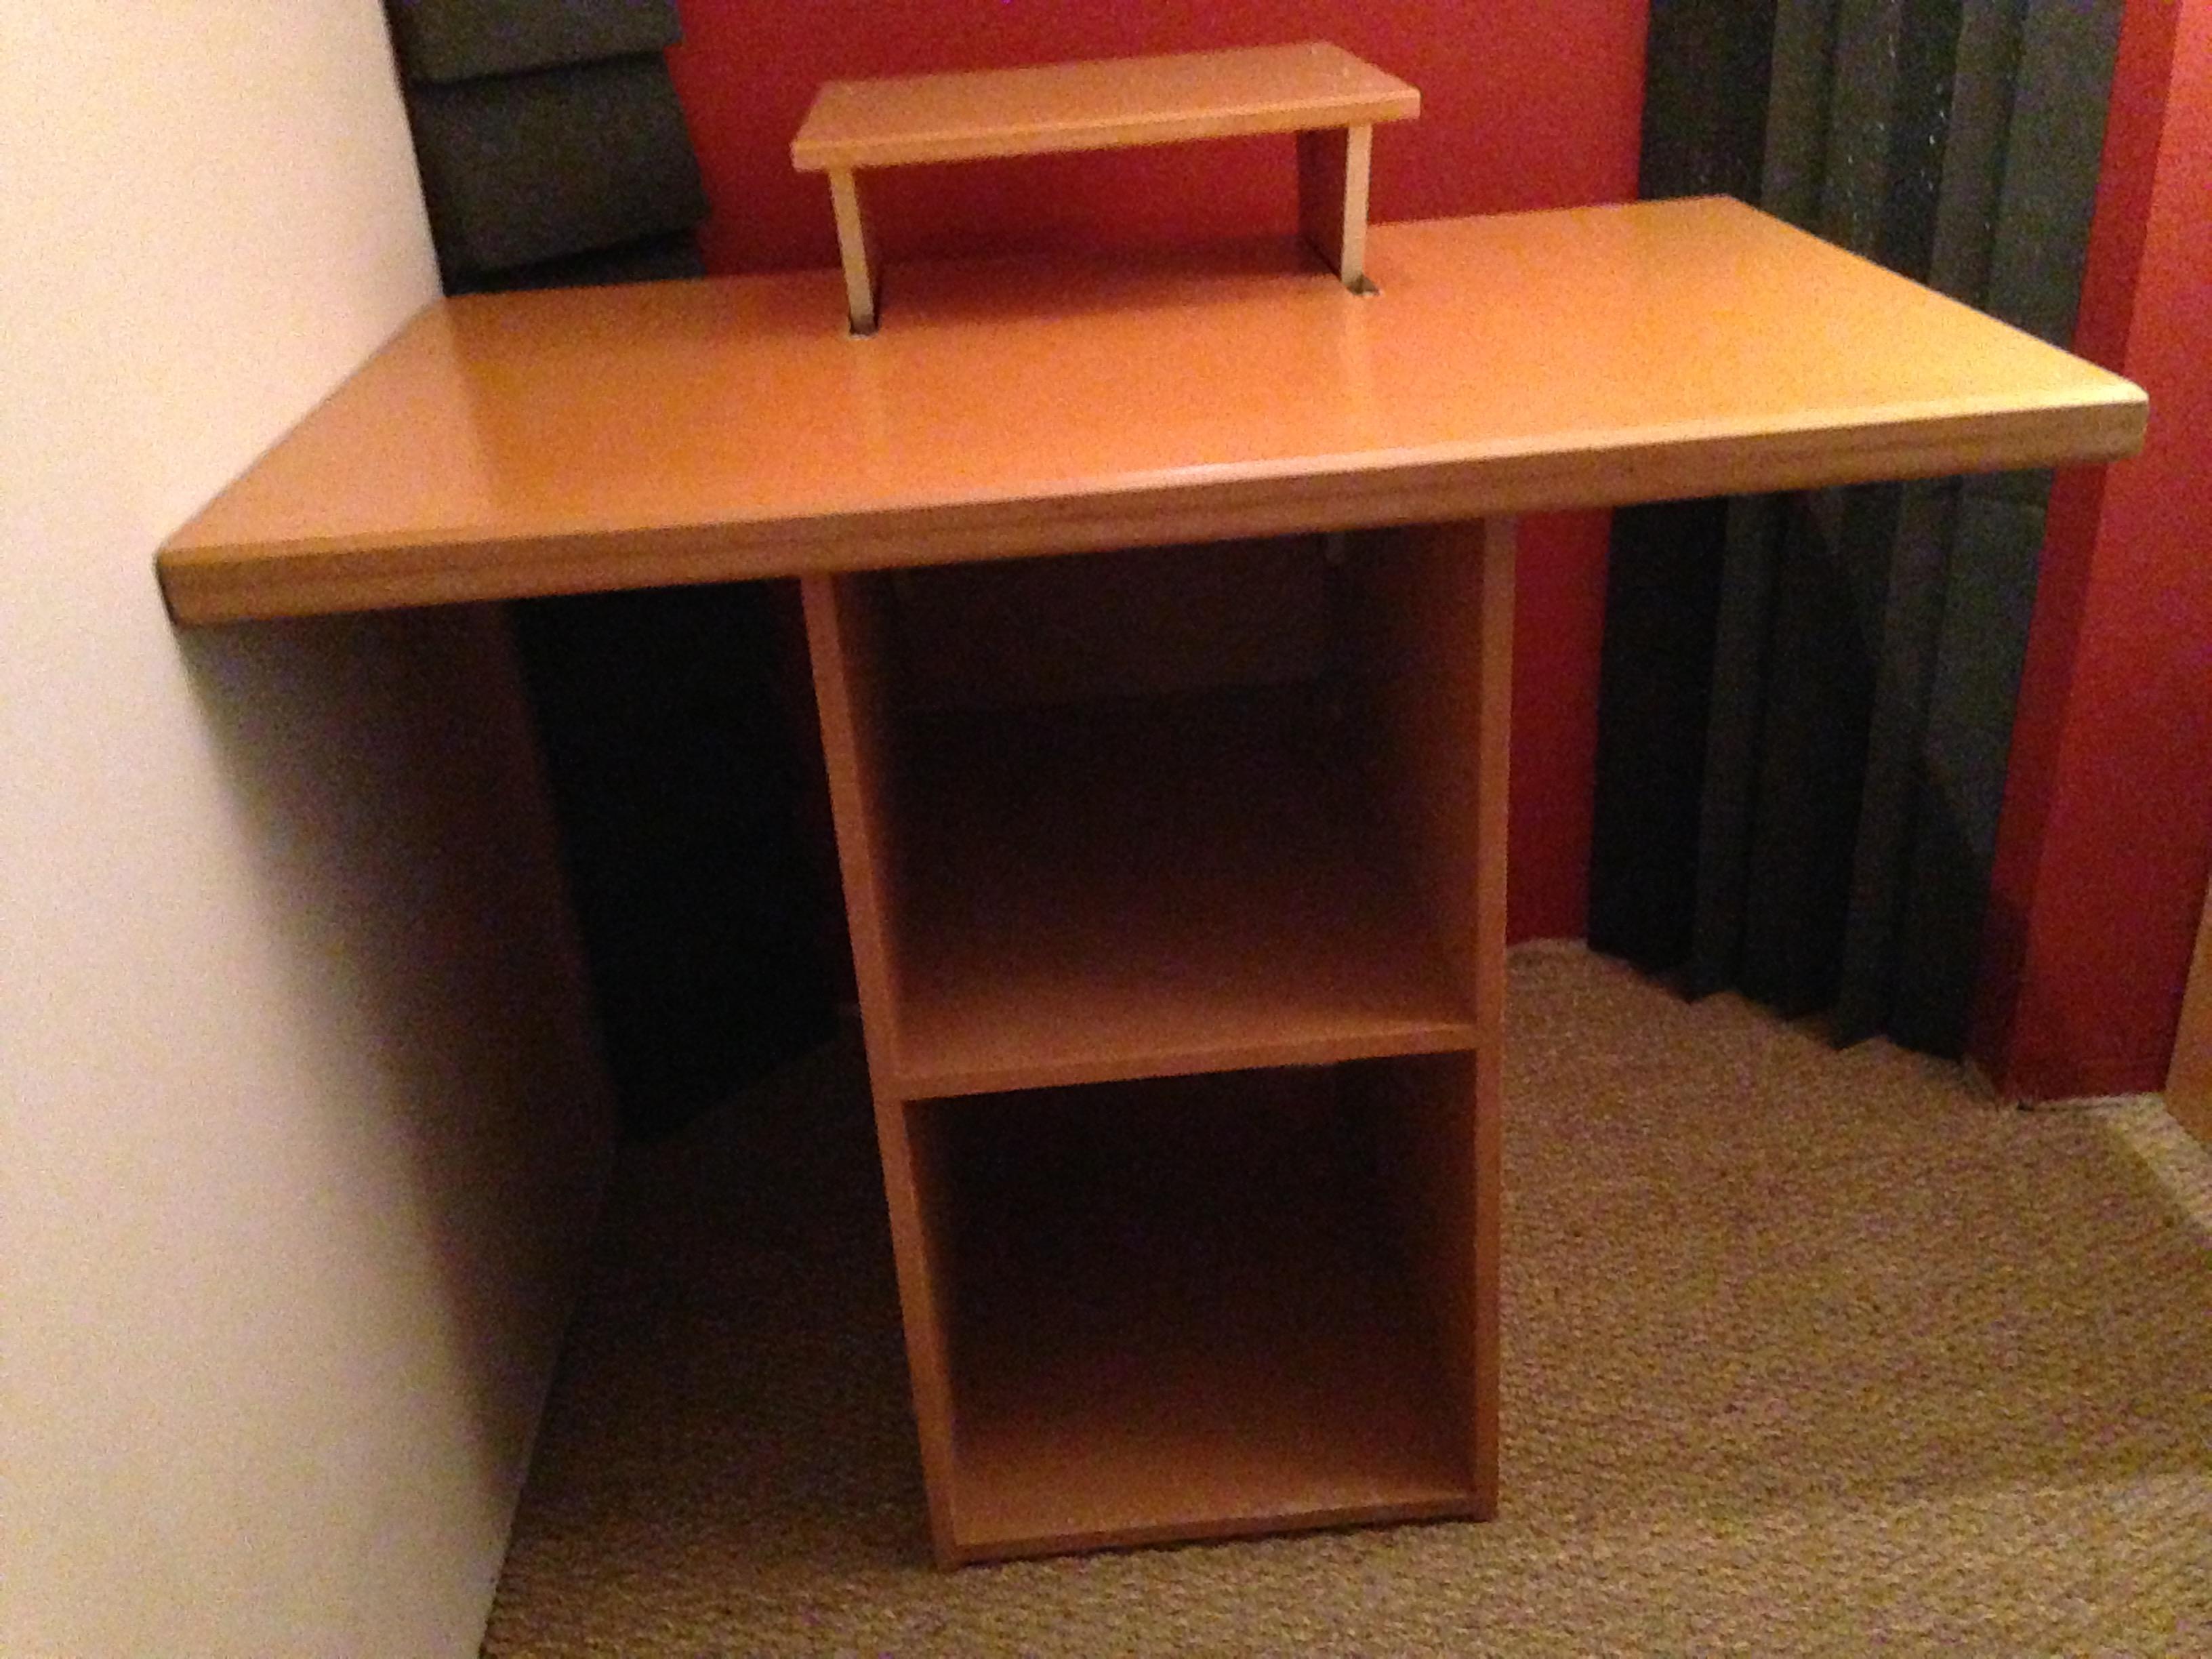 achat occasion no name meuble fait maison france. Black Bedroom Furniture Sets. Home Design Ideas